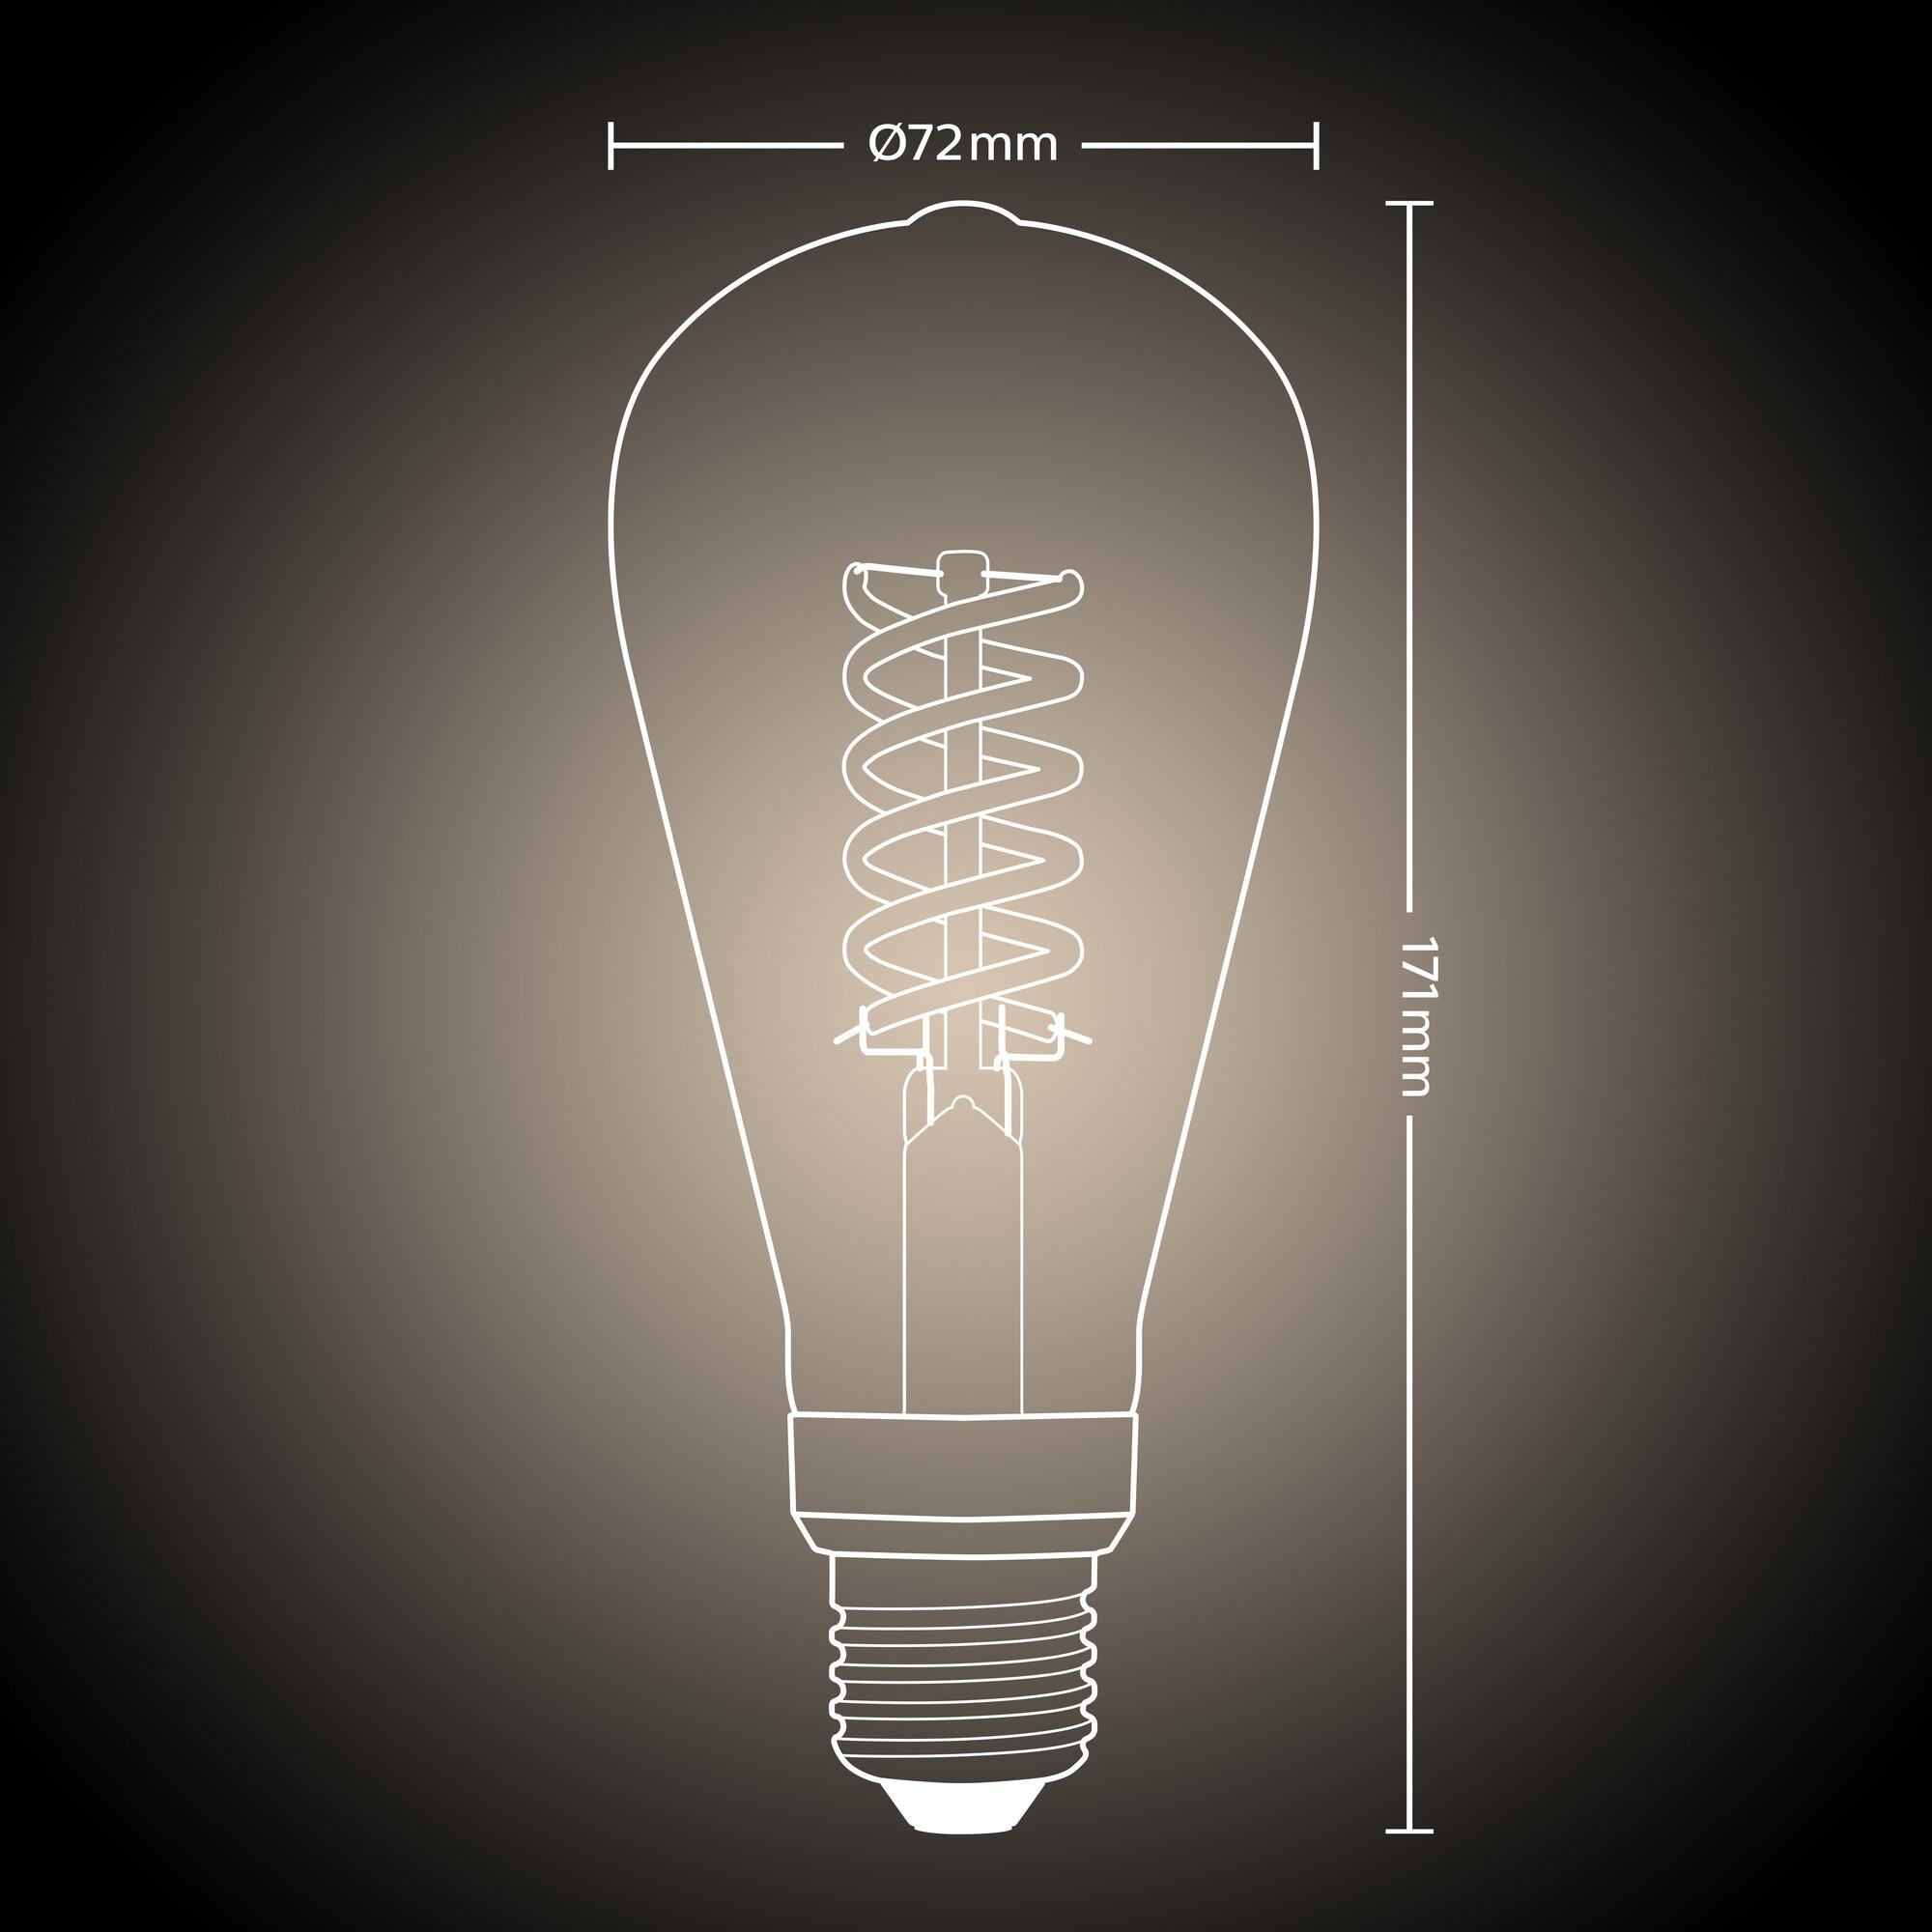 Philips HUE E27 7W 550lm 2100K Edison